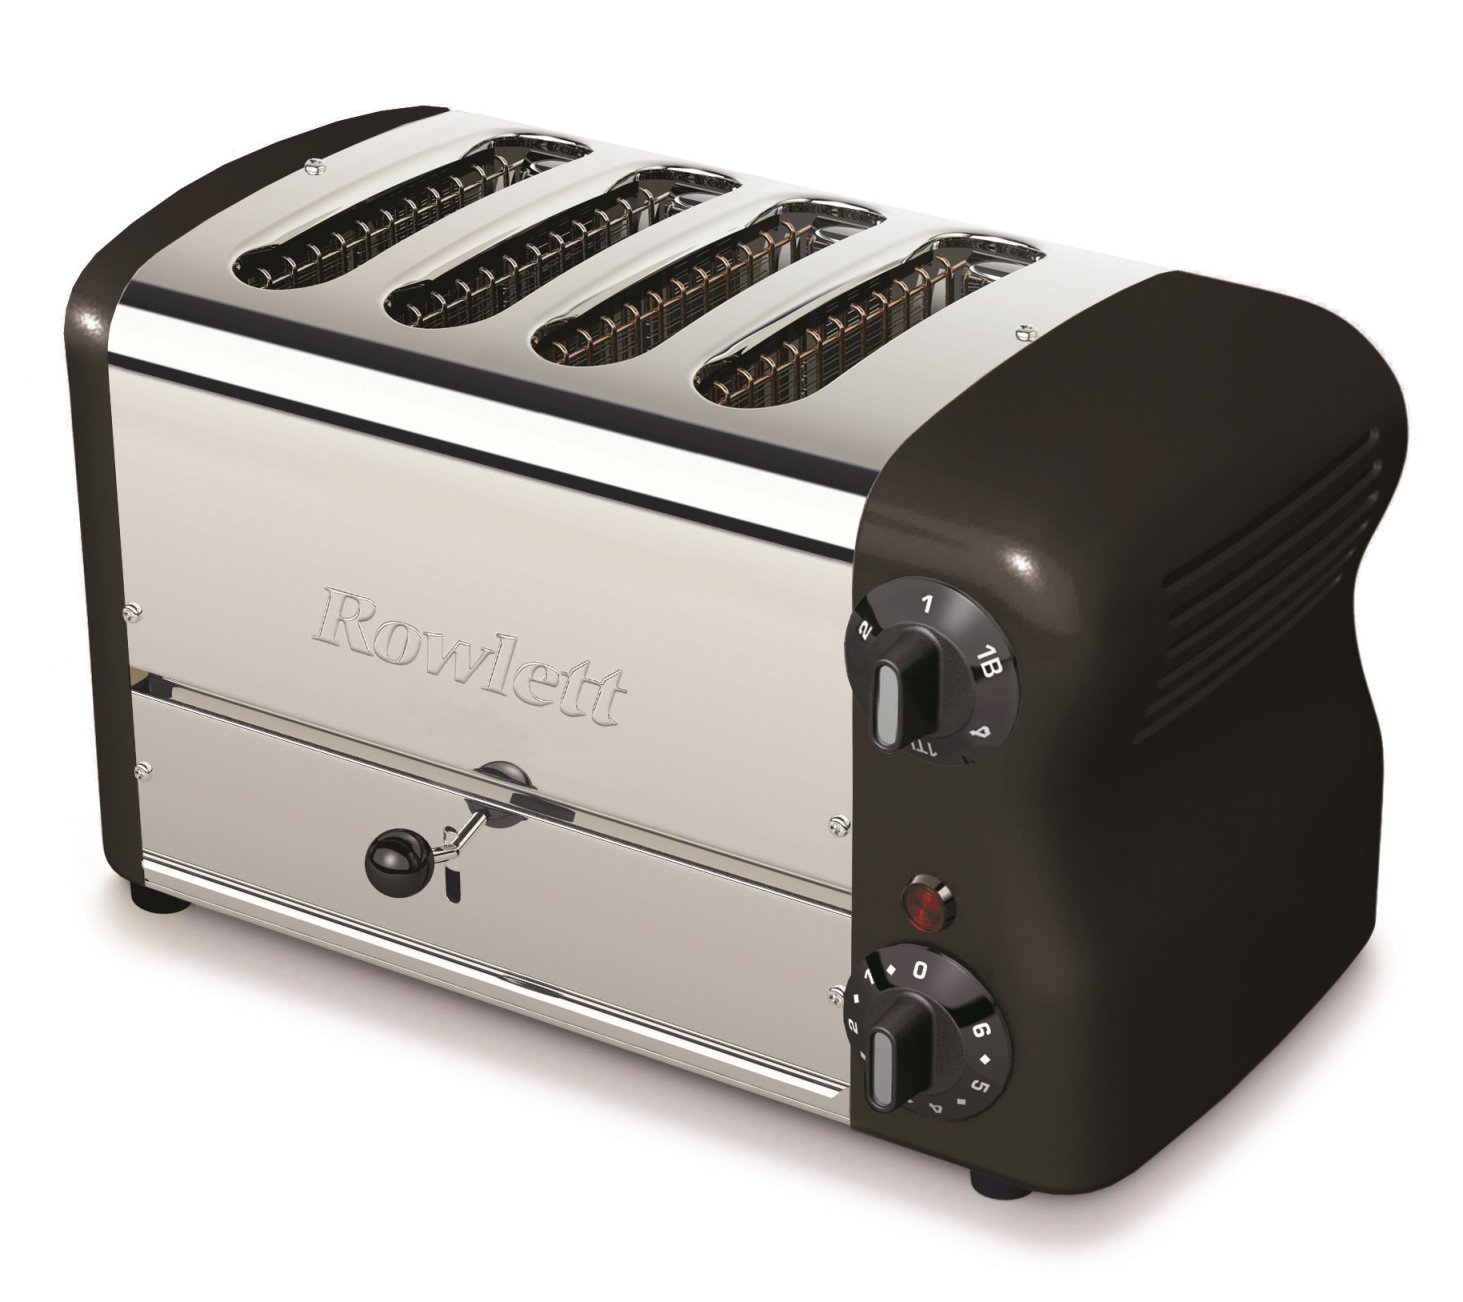 Rowlett Rutland Esprit 4 Slot Thick N Thin Toaster With